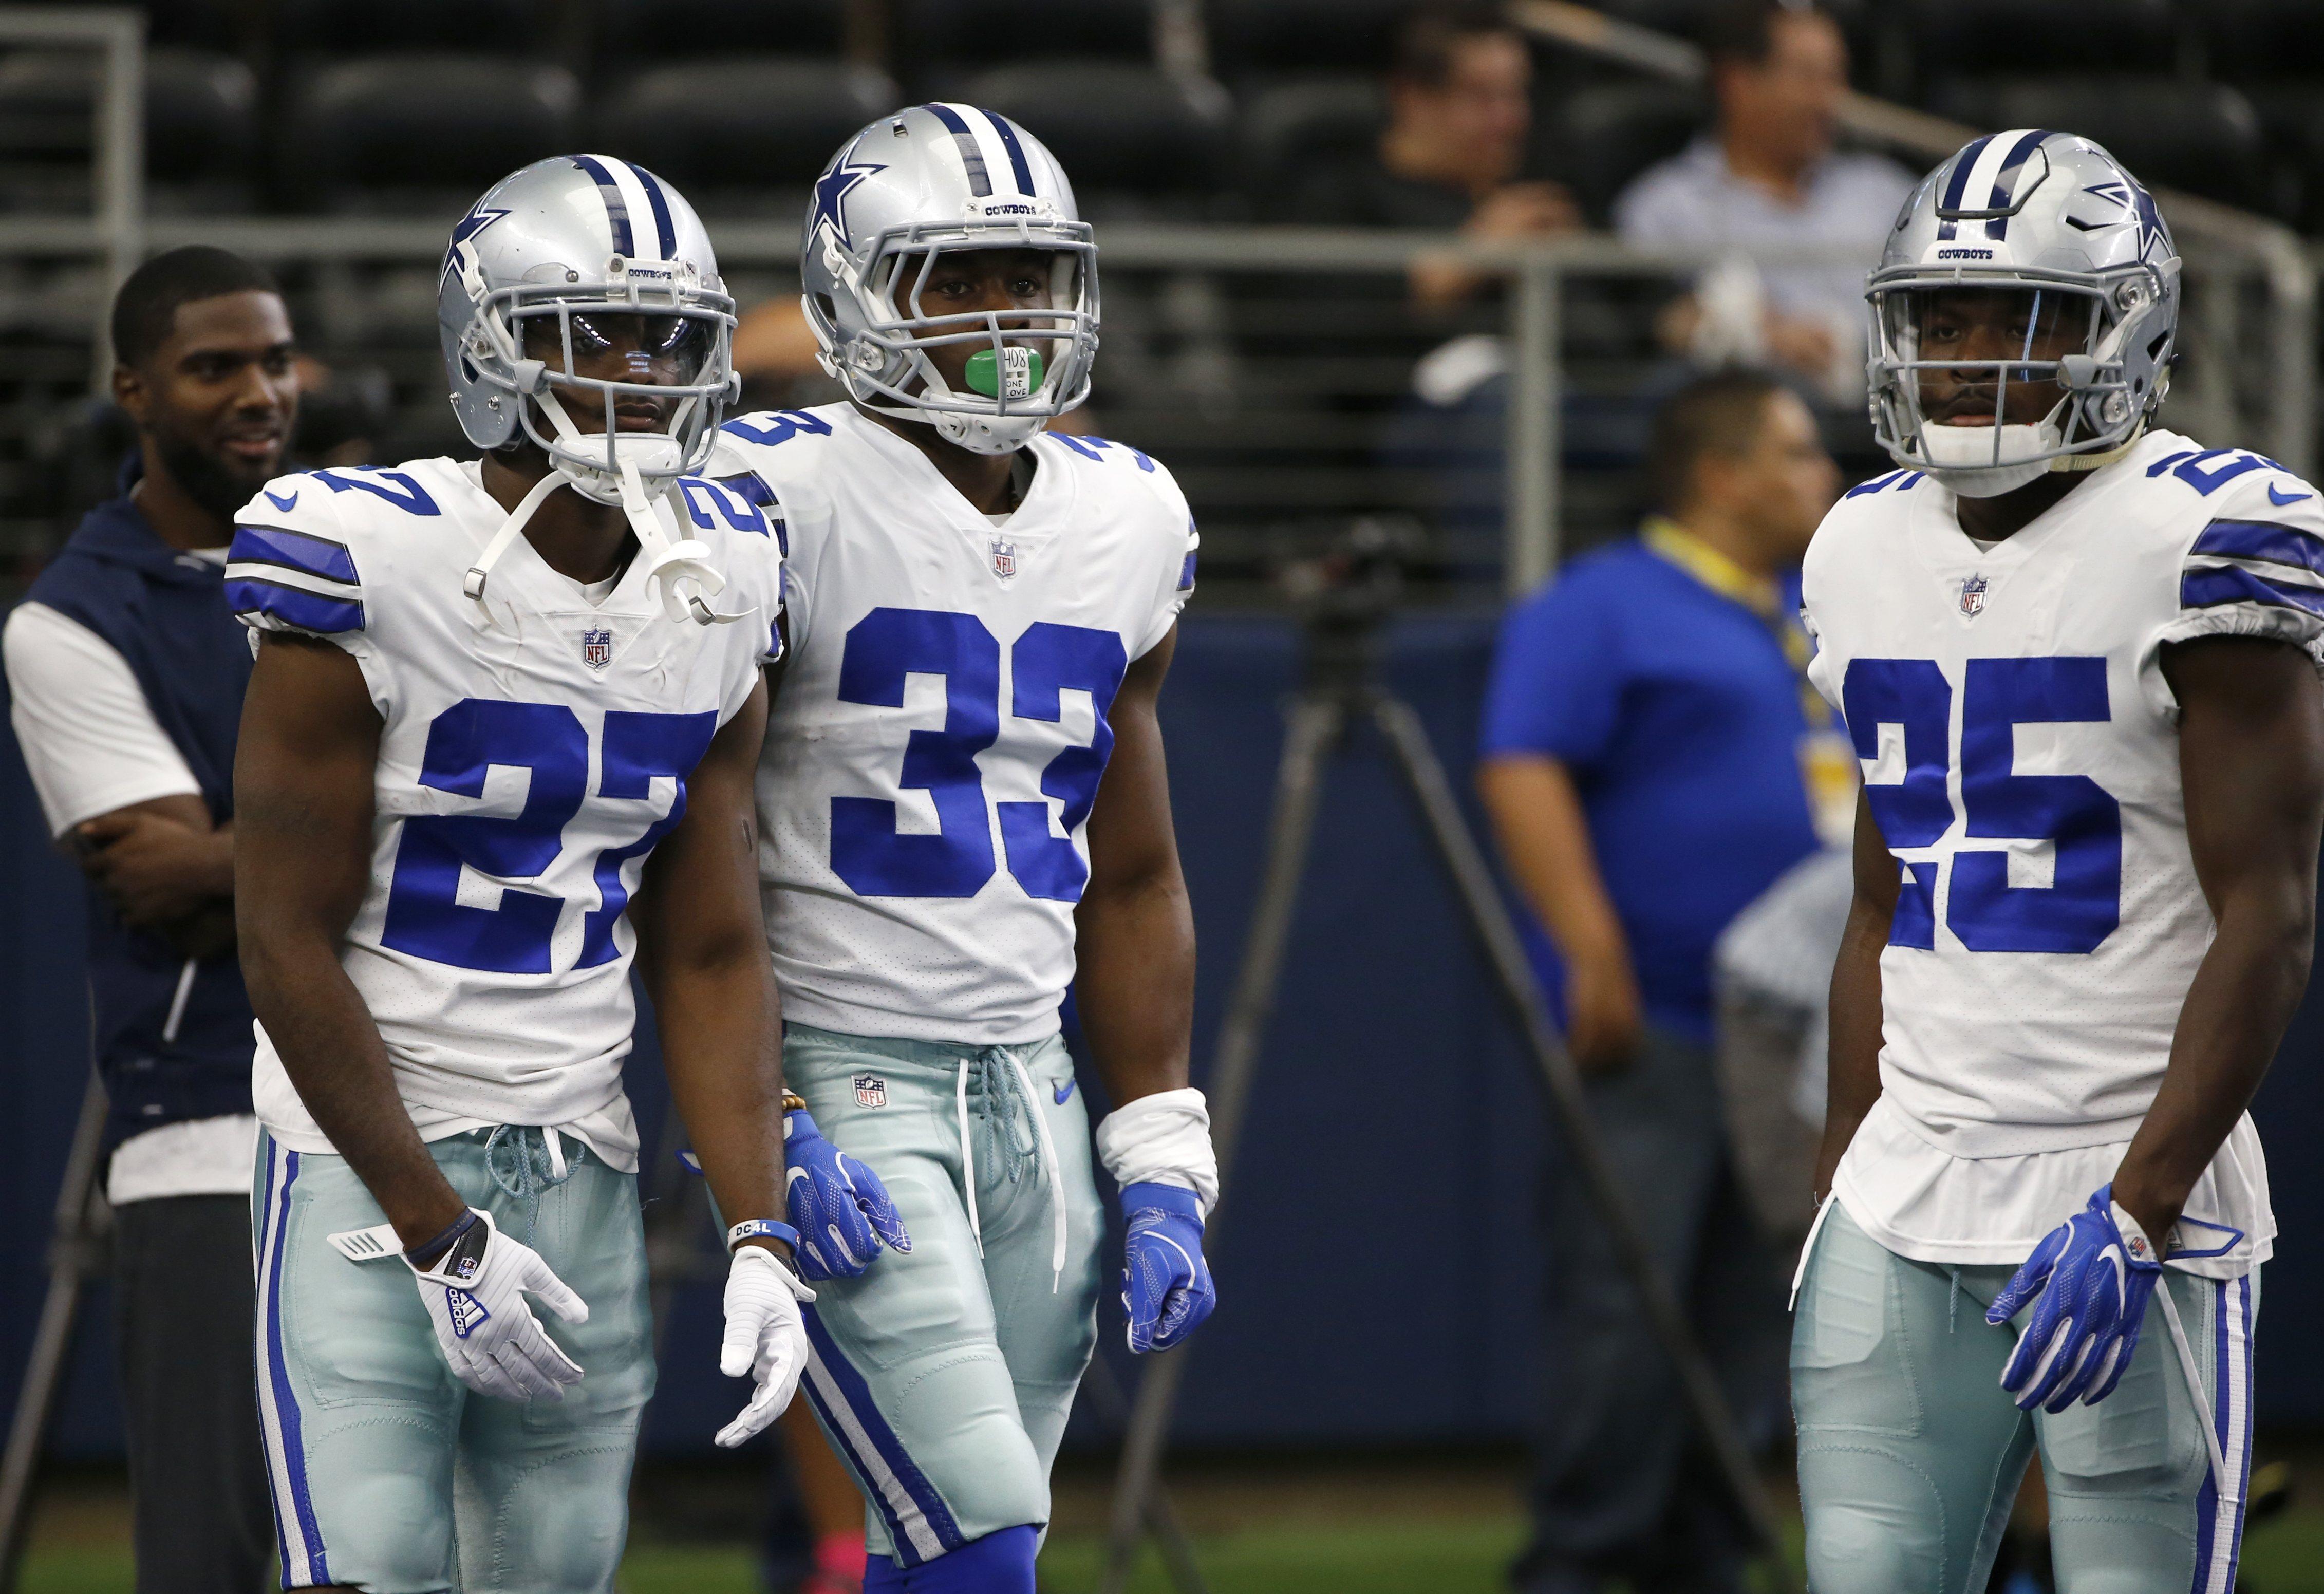 Cowboys' Witten retires, joins ESPN broadcast booth